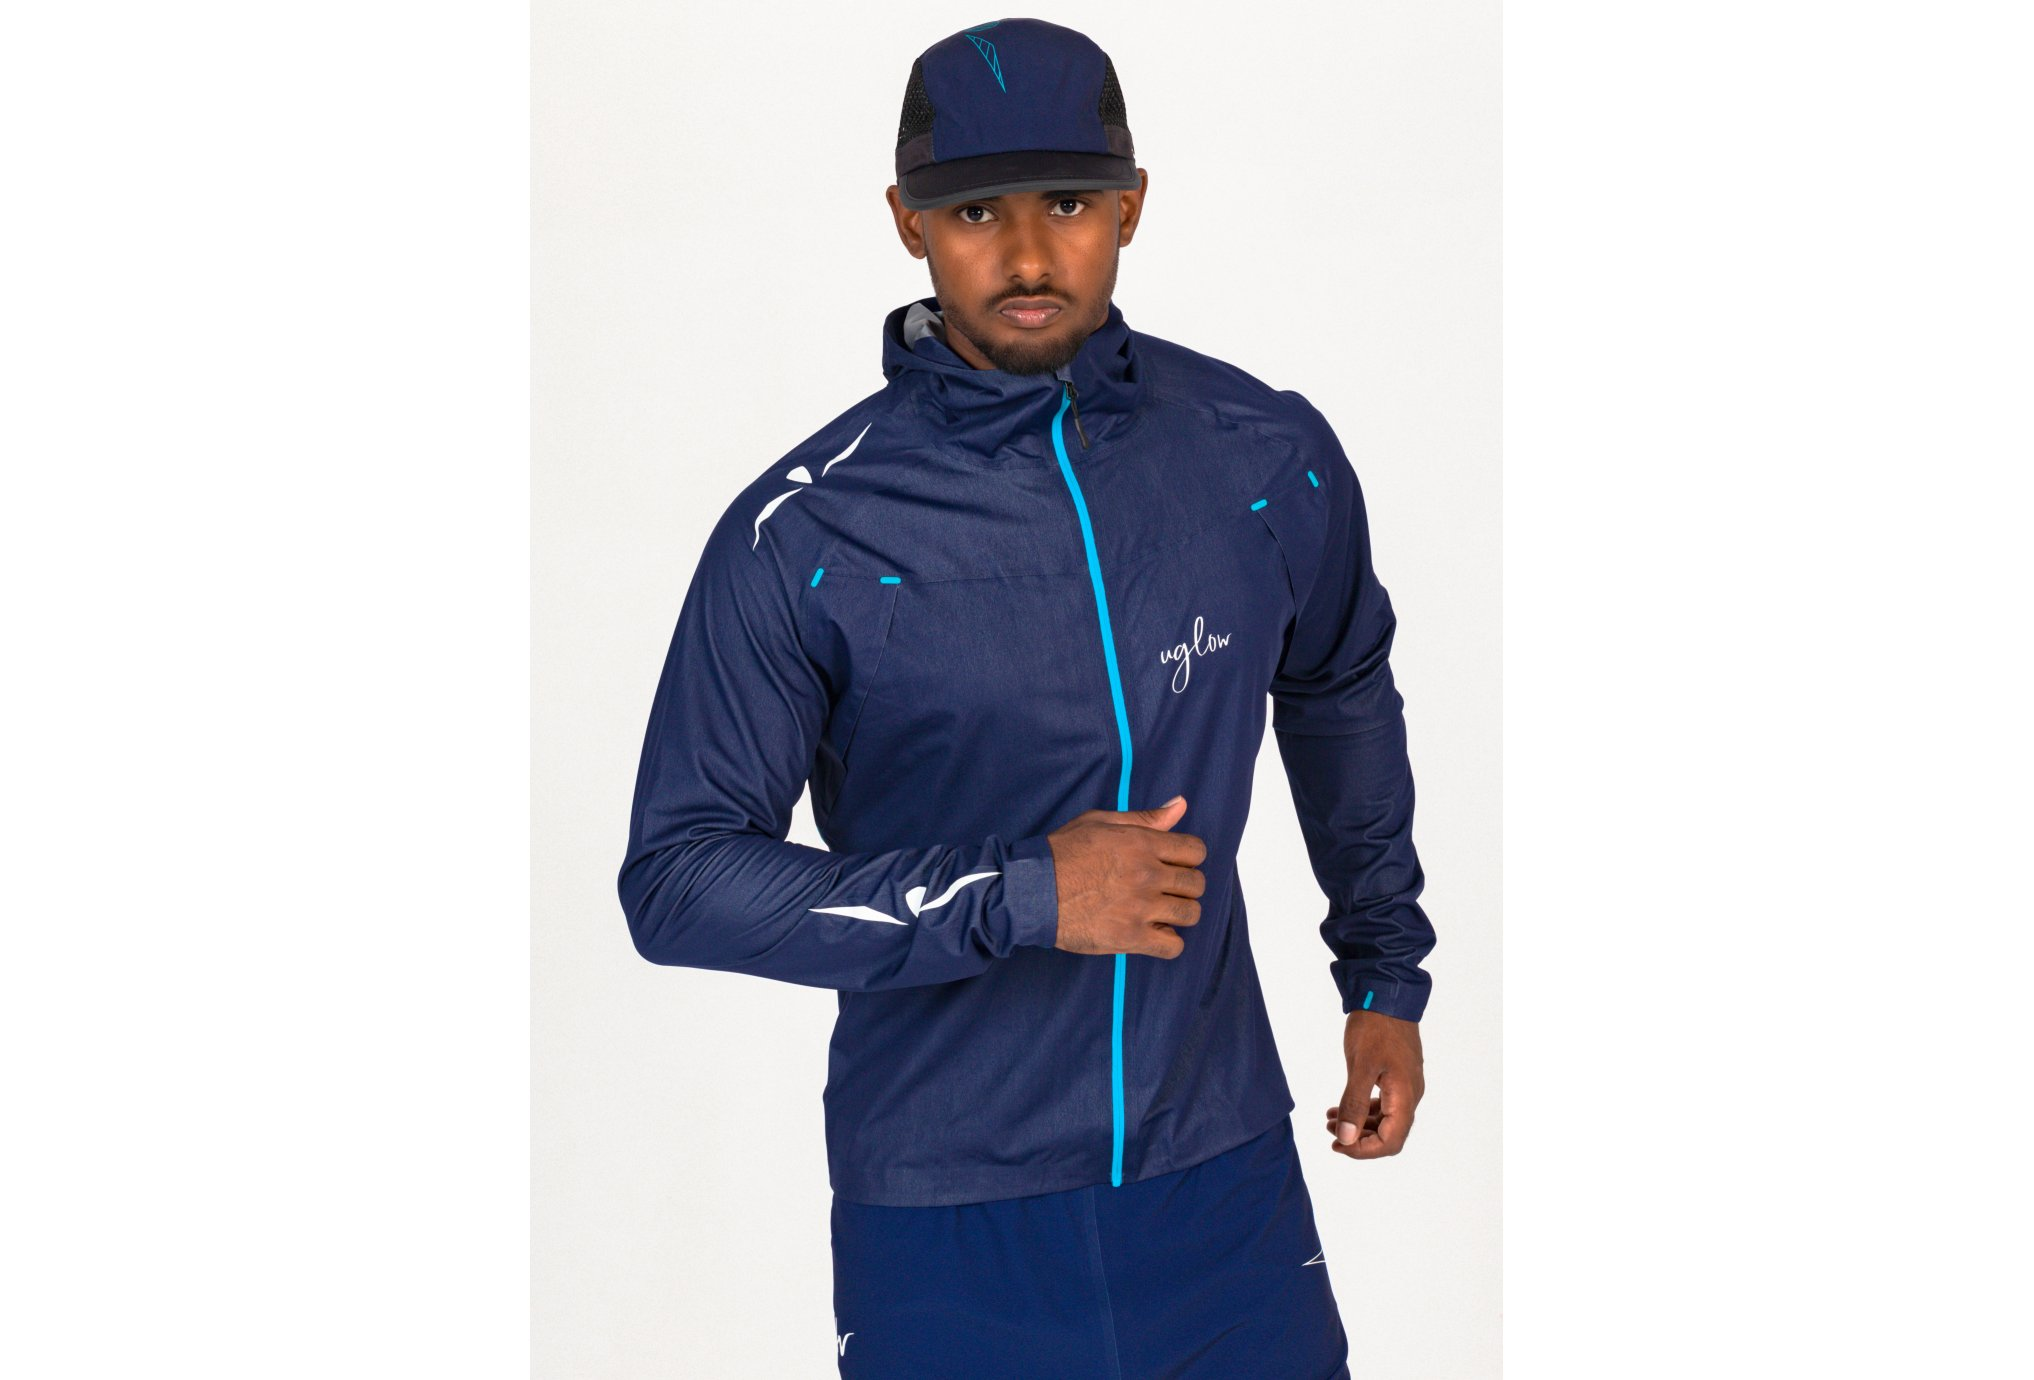 Uglow Rain Jacket-X M vêtement running homme